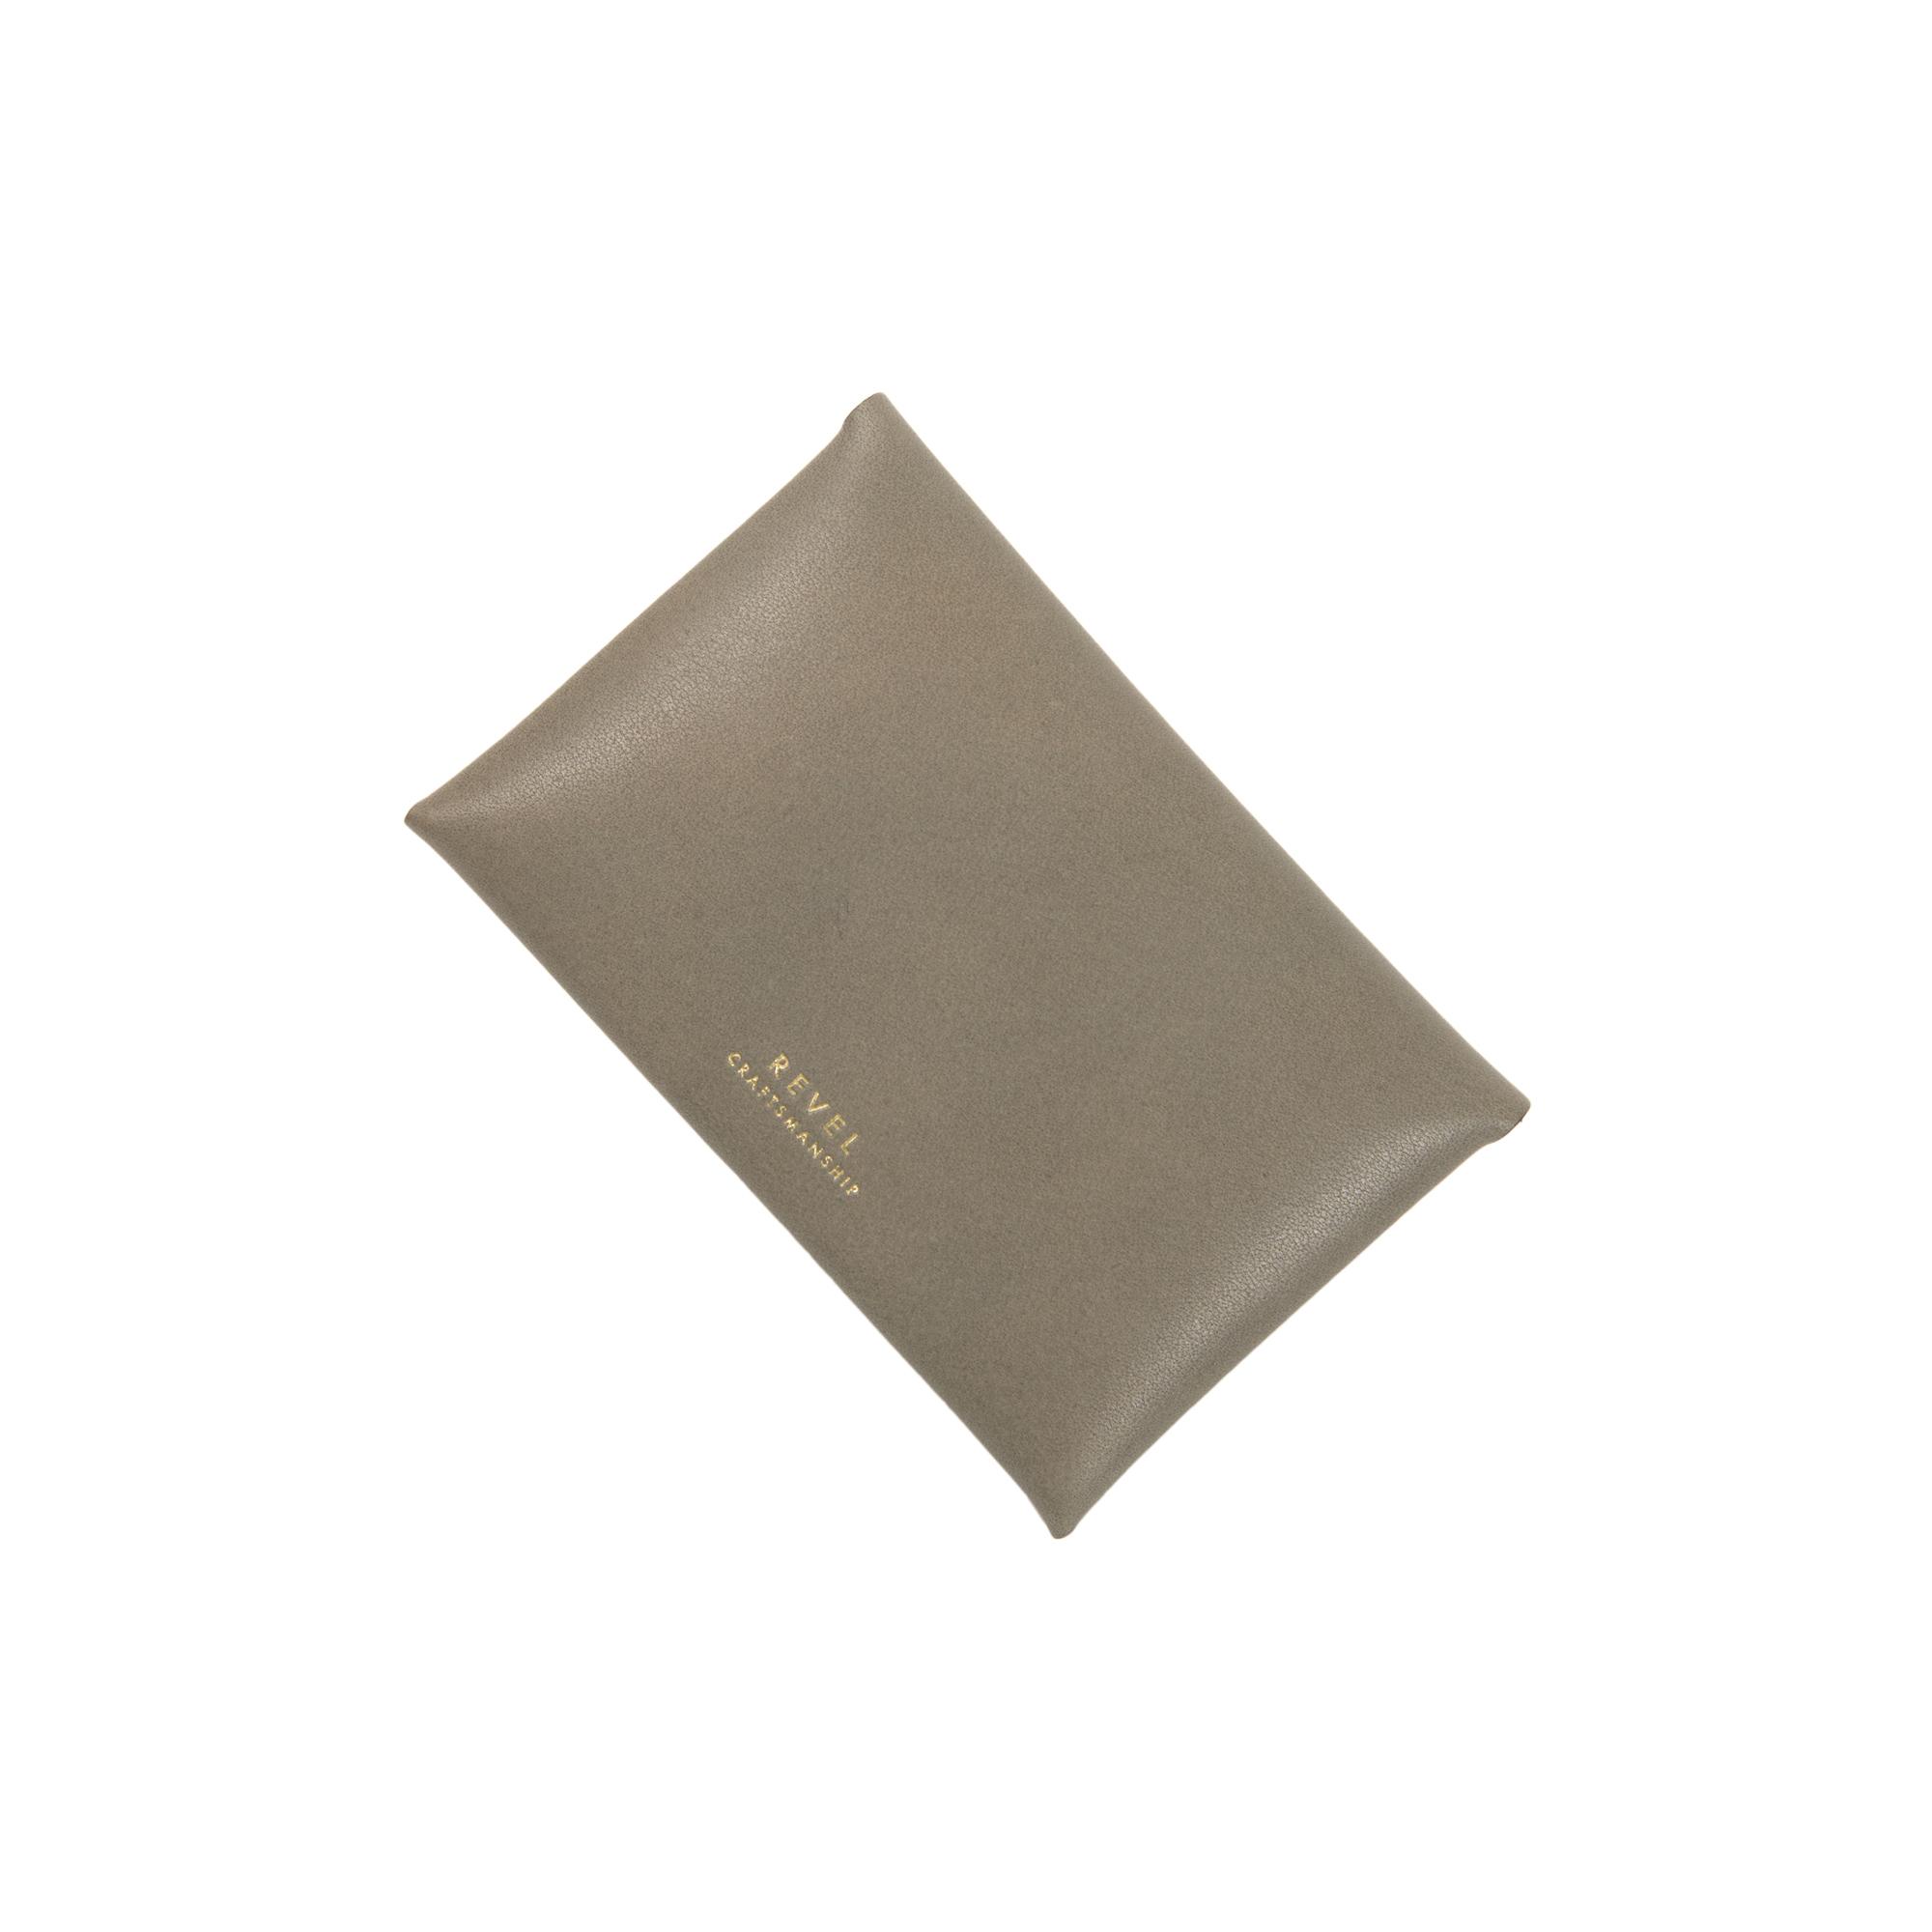 SLIM CARD CASE GRAY [EST OIL]